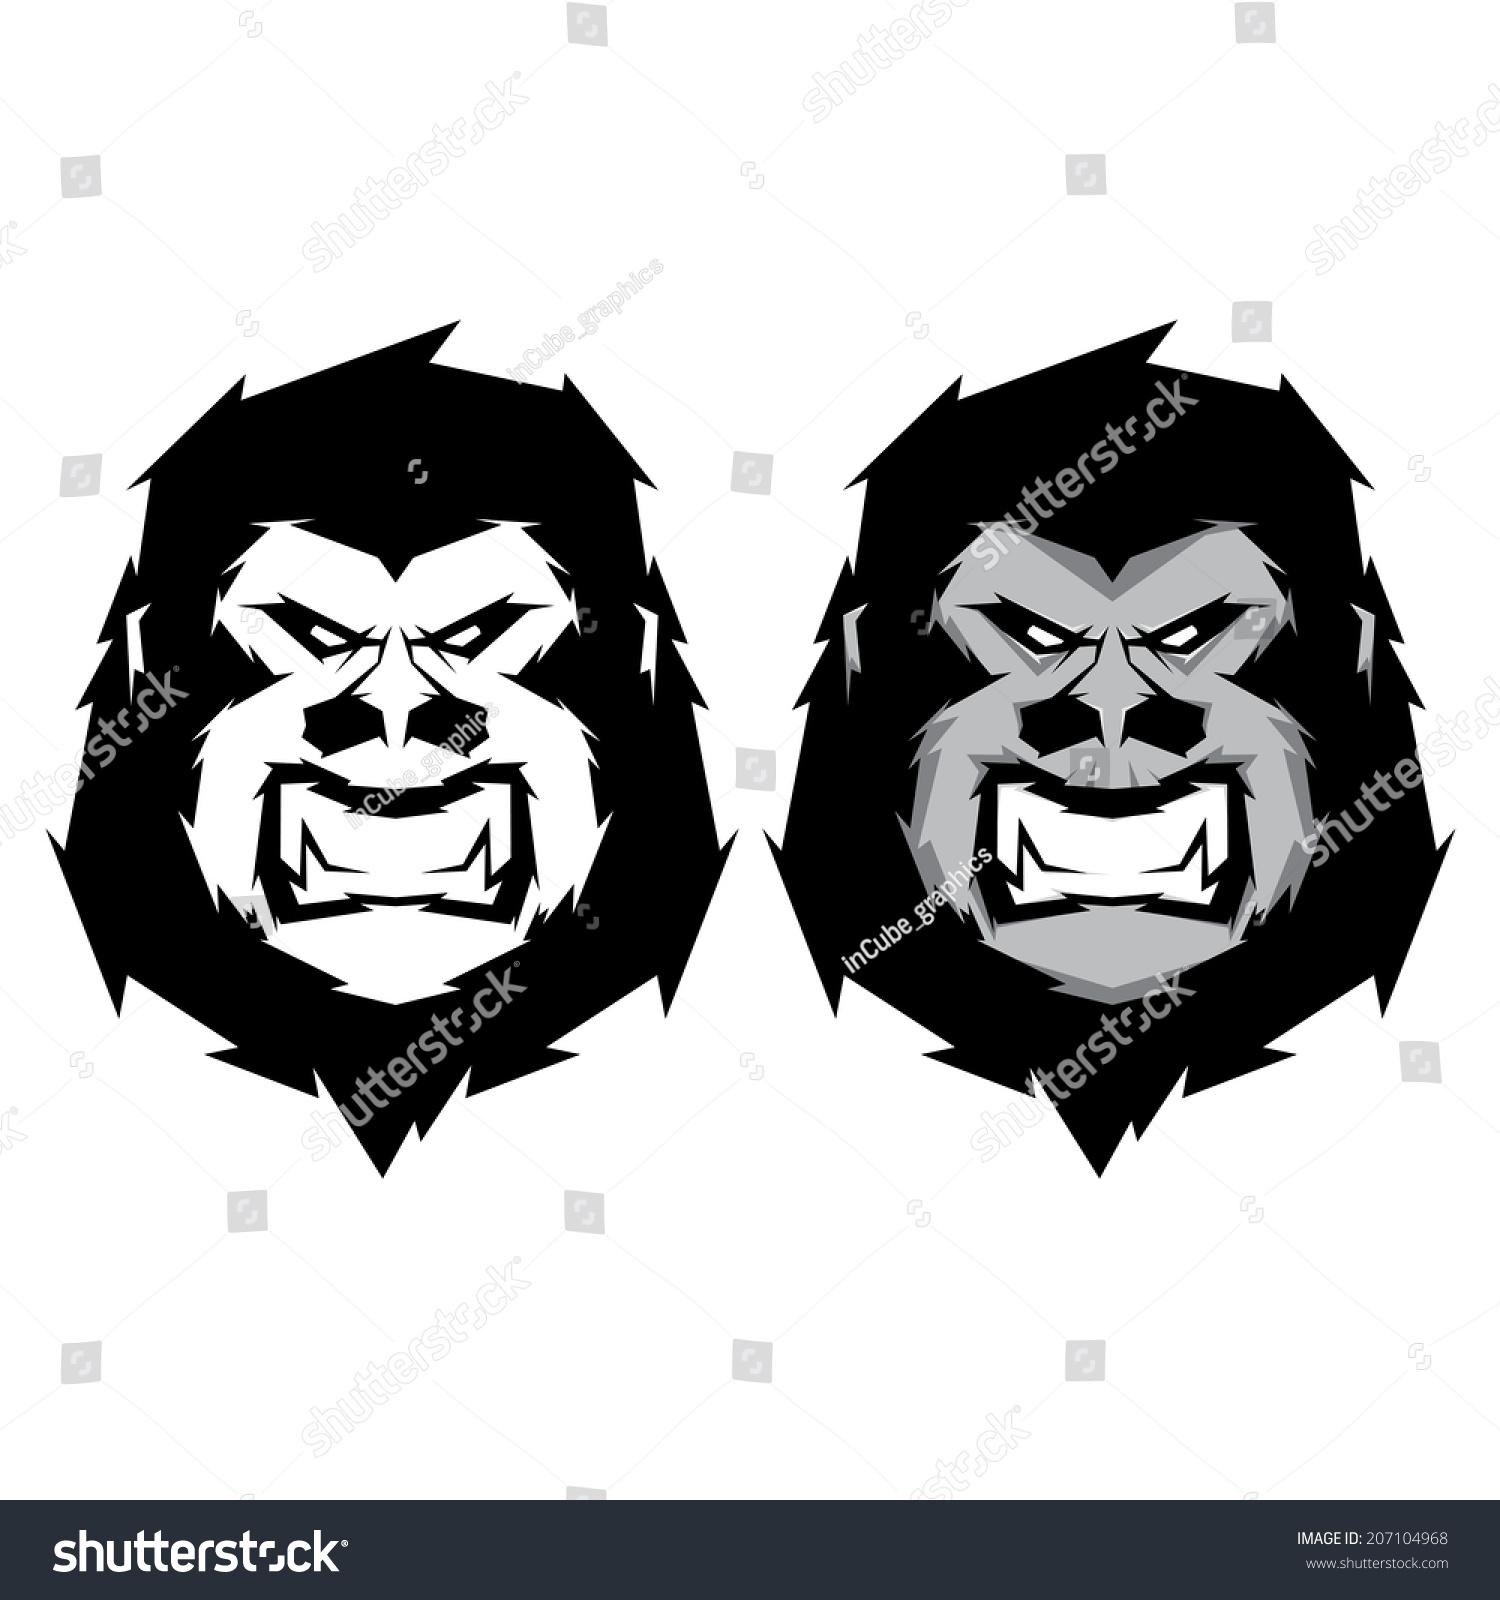 Gorilla vector head - photo#26